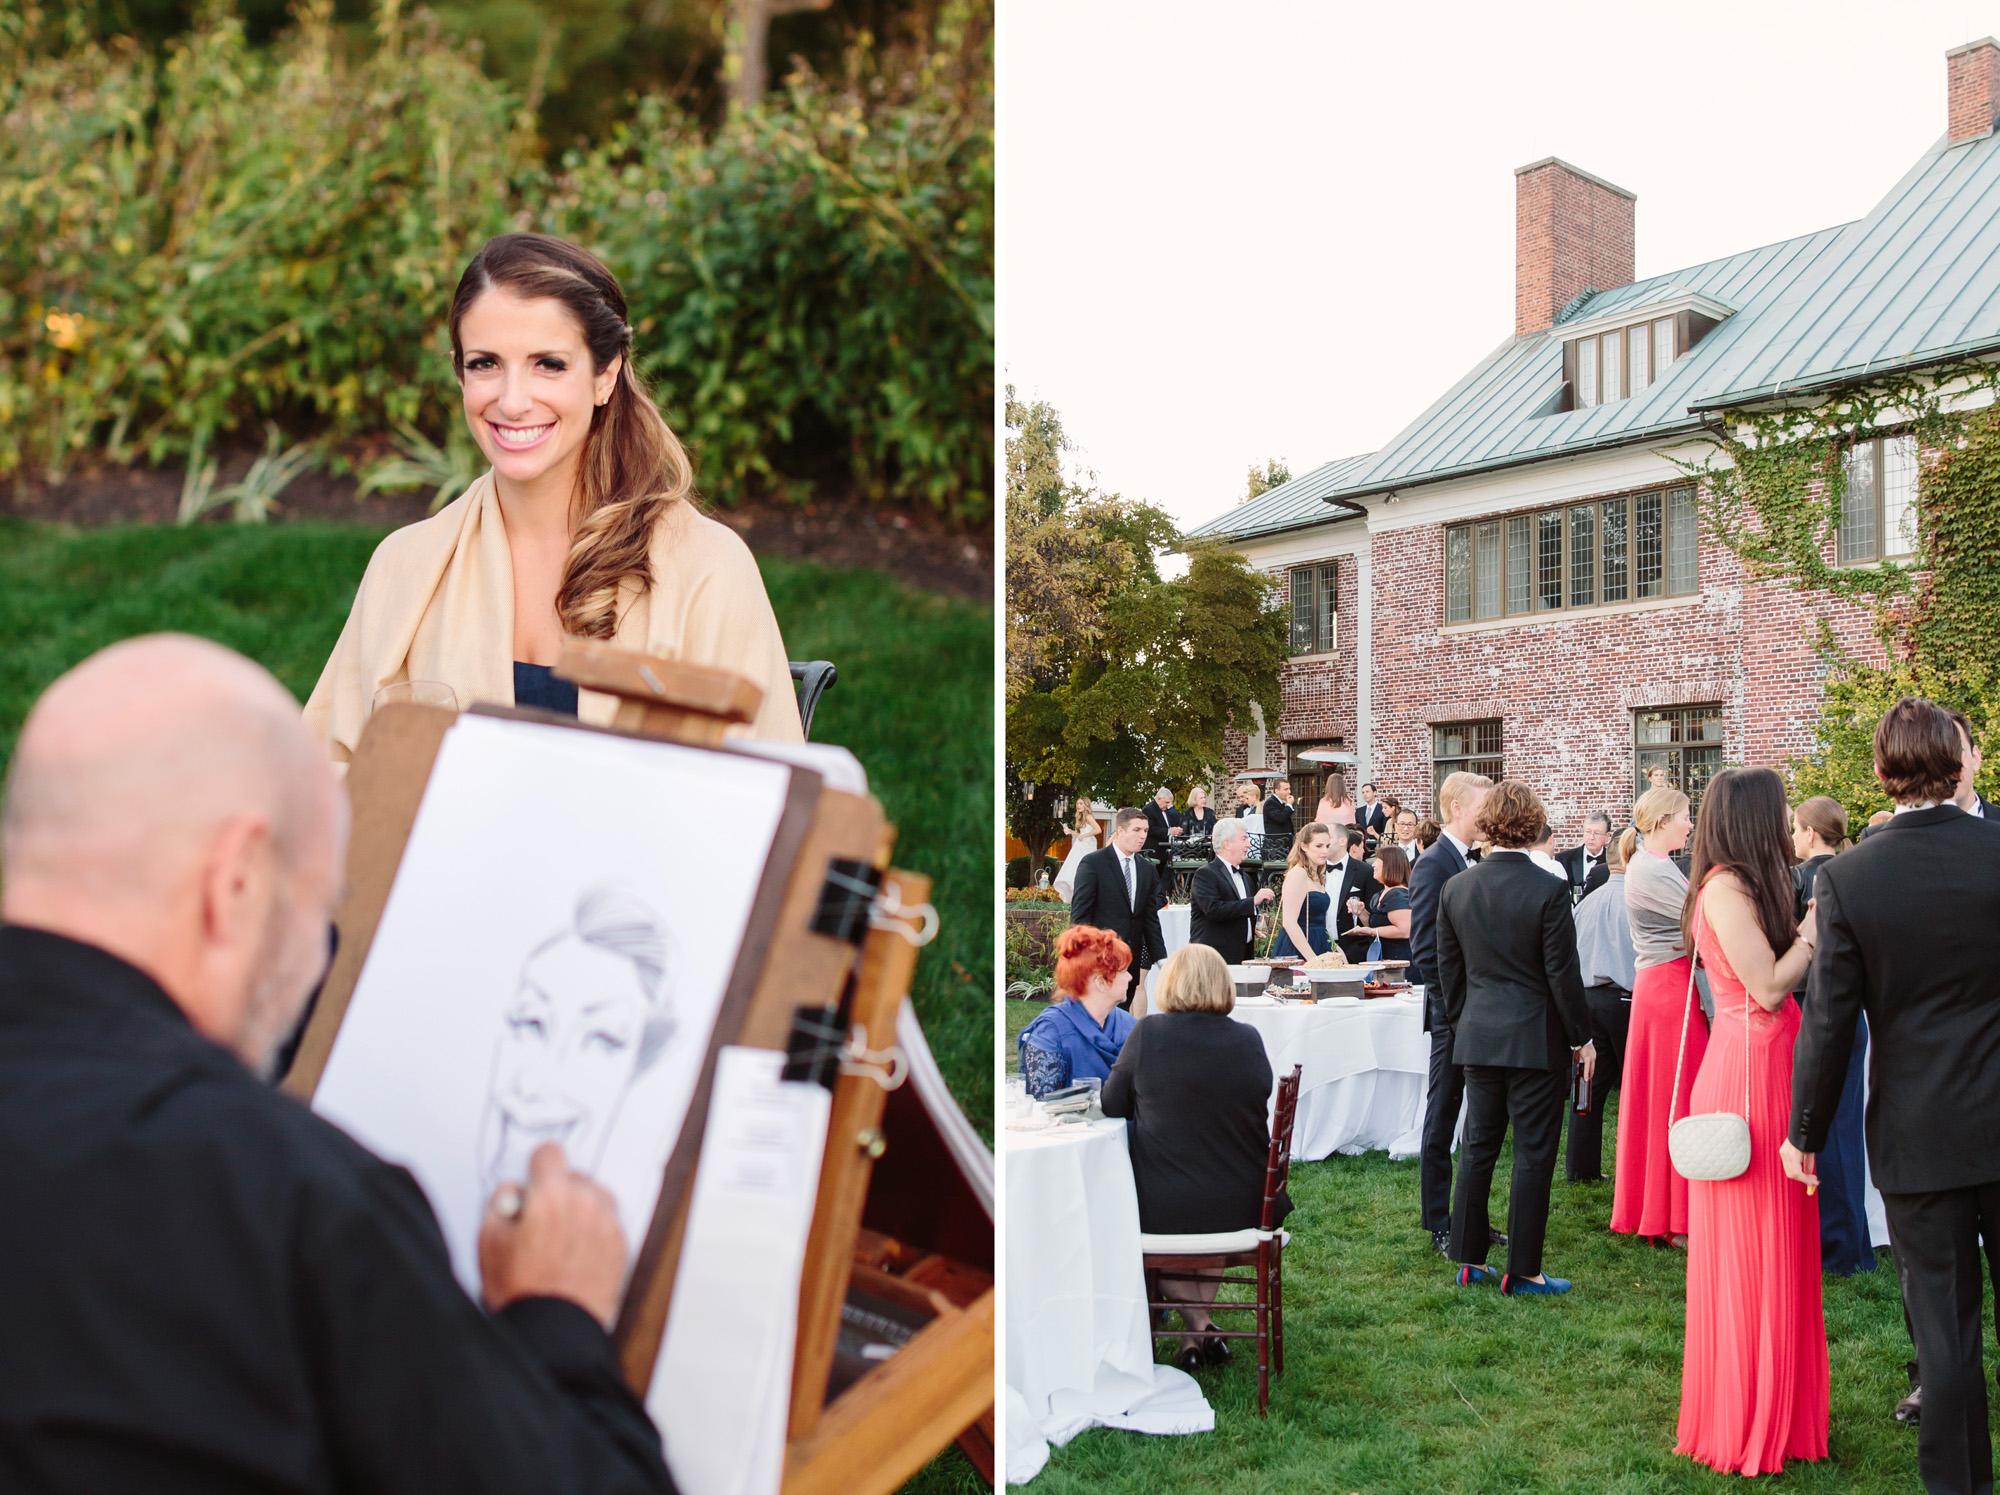 52_Christina_Daniel_Hamilton_Farm_Golf_Club_Wedding_NJ_Tanya_Salazar_Photography.jpg